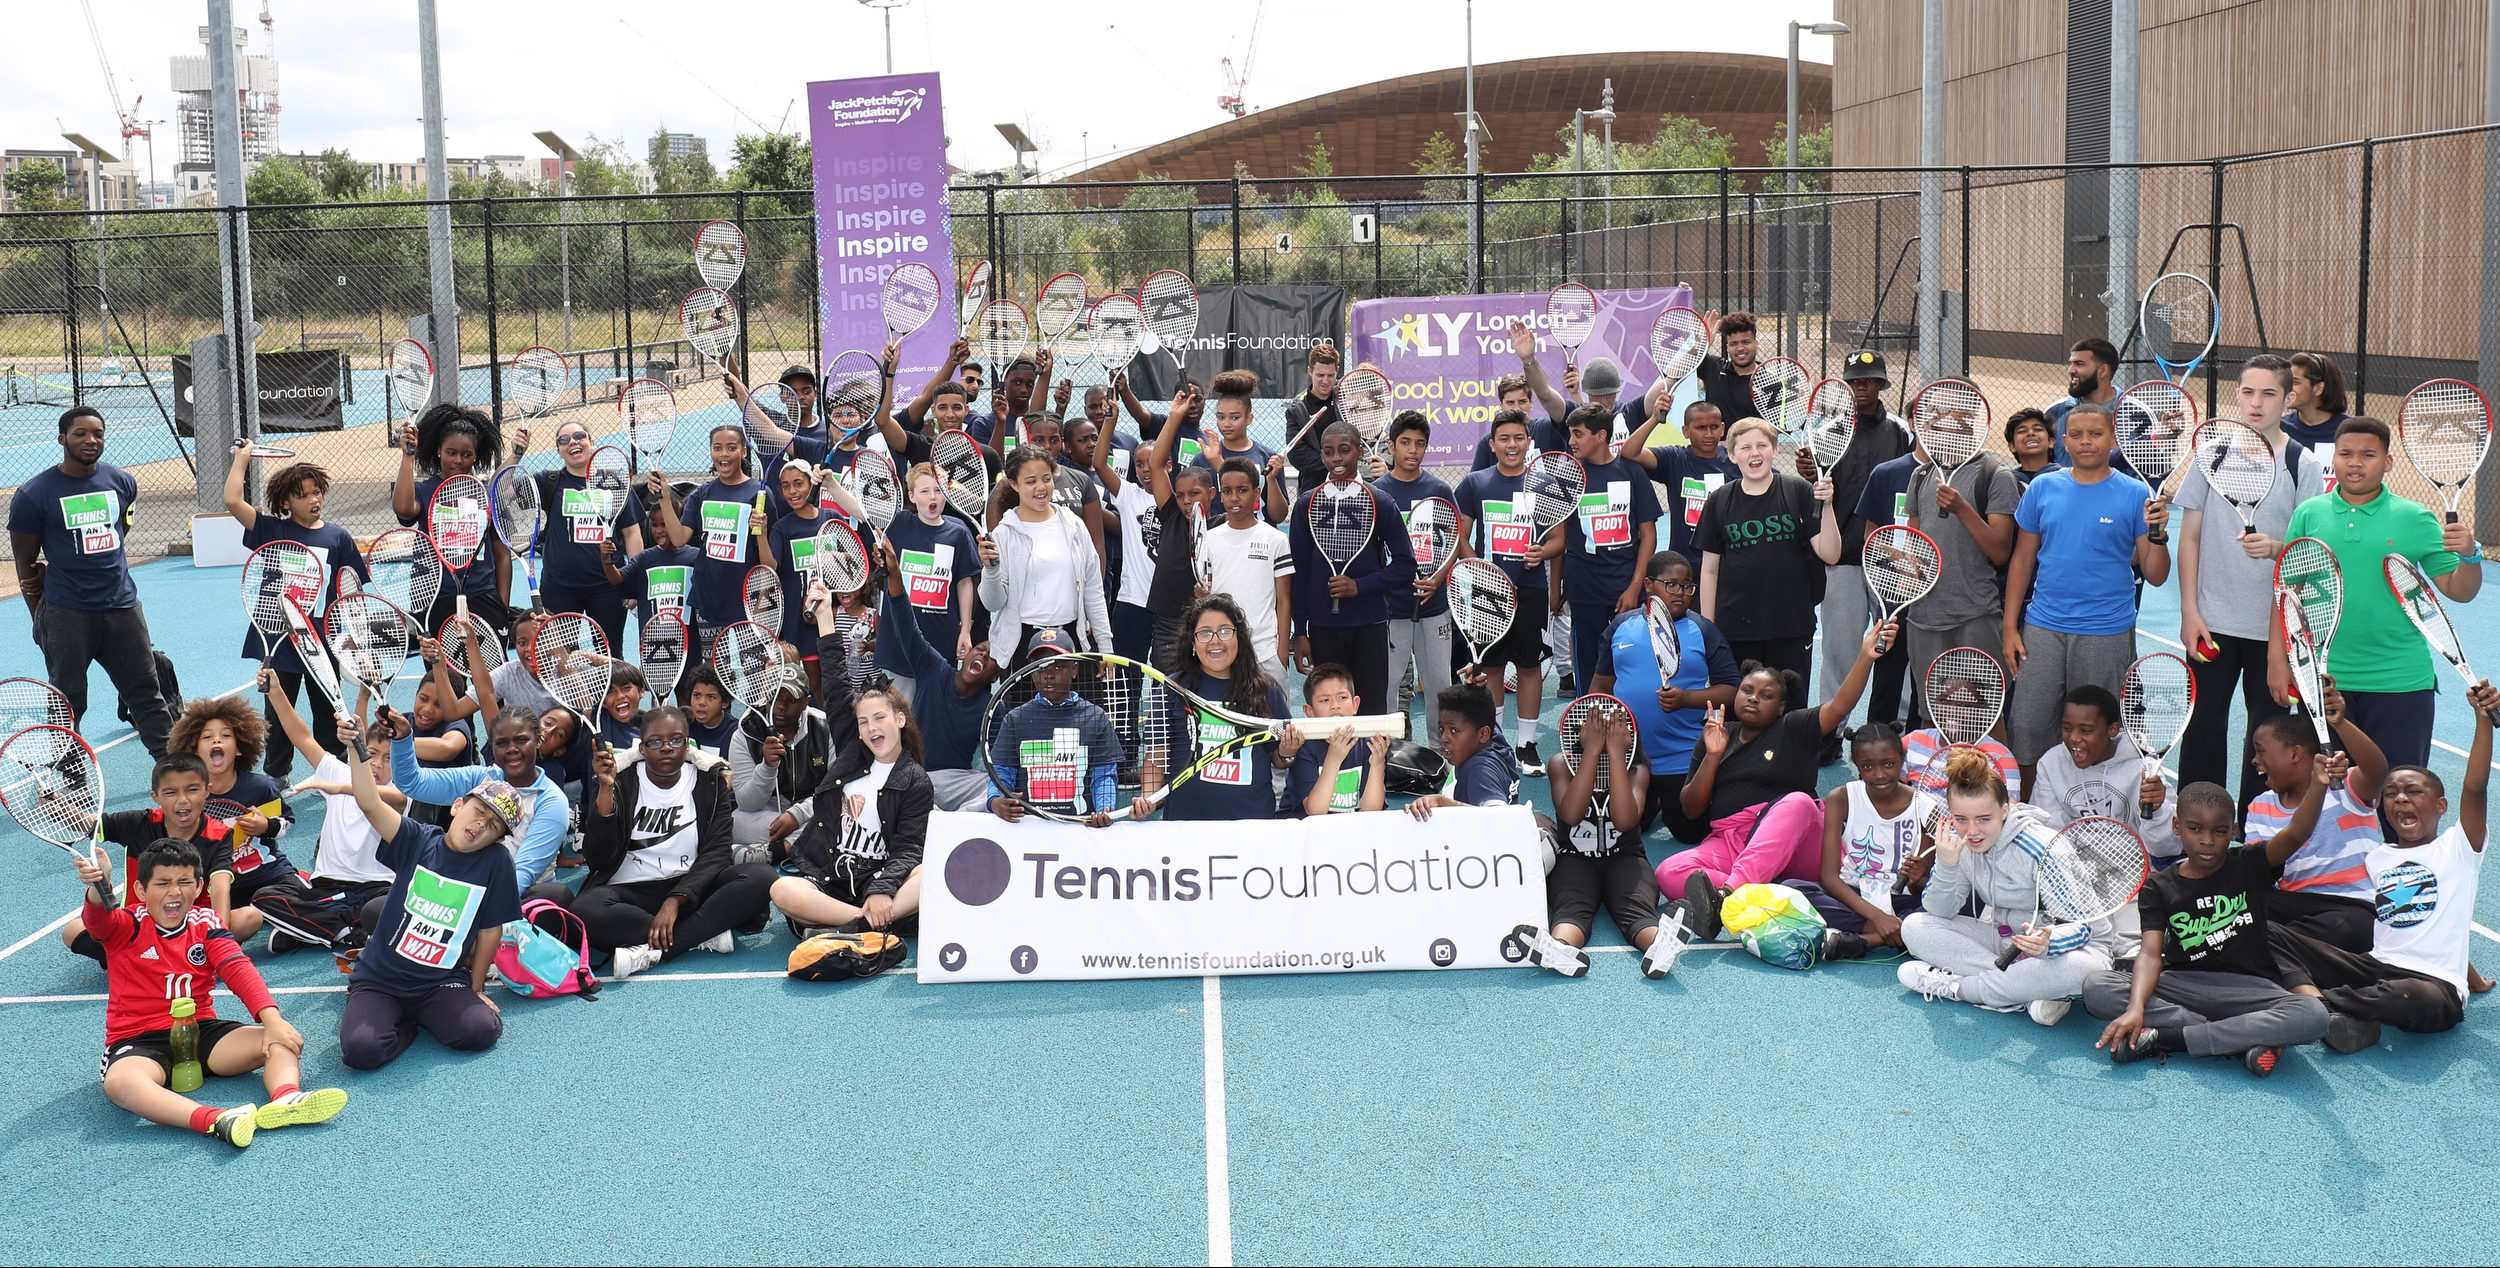 Tennis Festival group shot